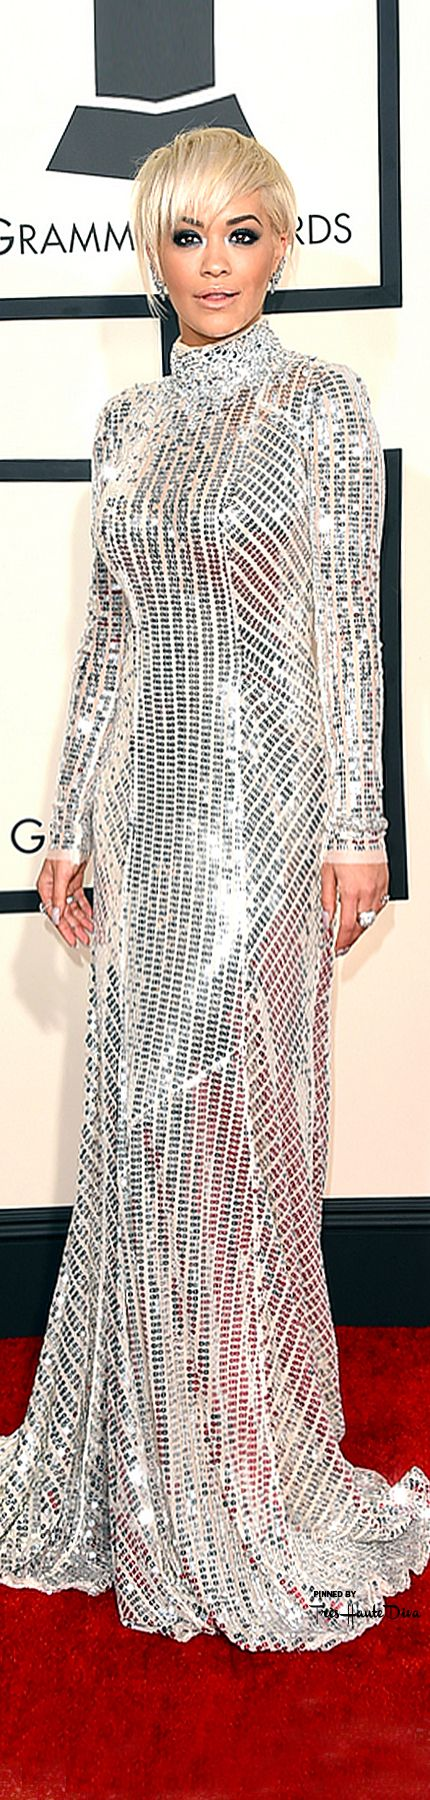 #Rita #Ora at the 57th Annual #Grammy Awards 2015 in Prada ♔THD♔